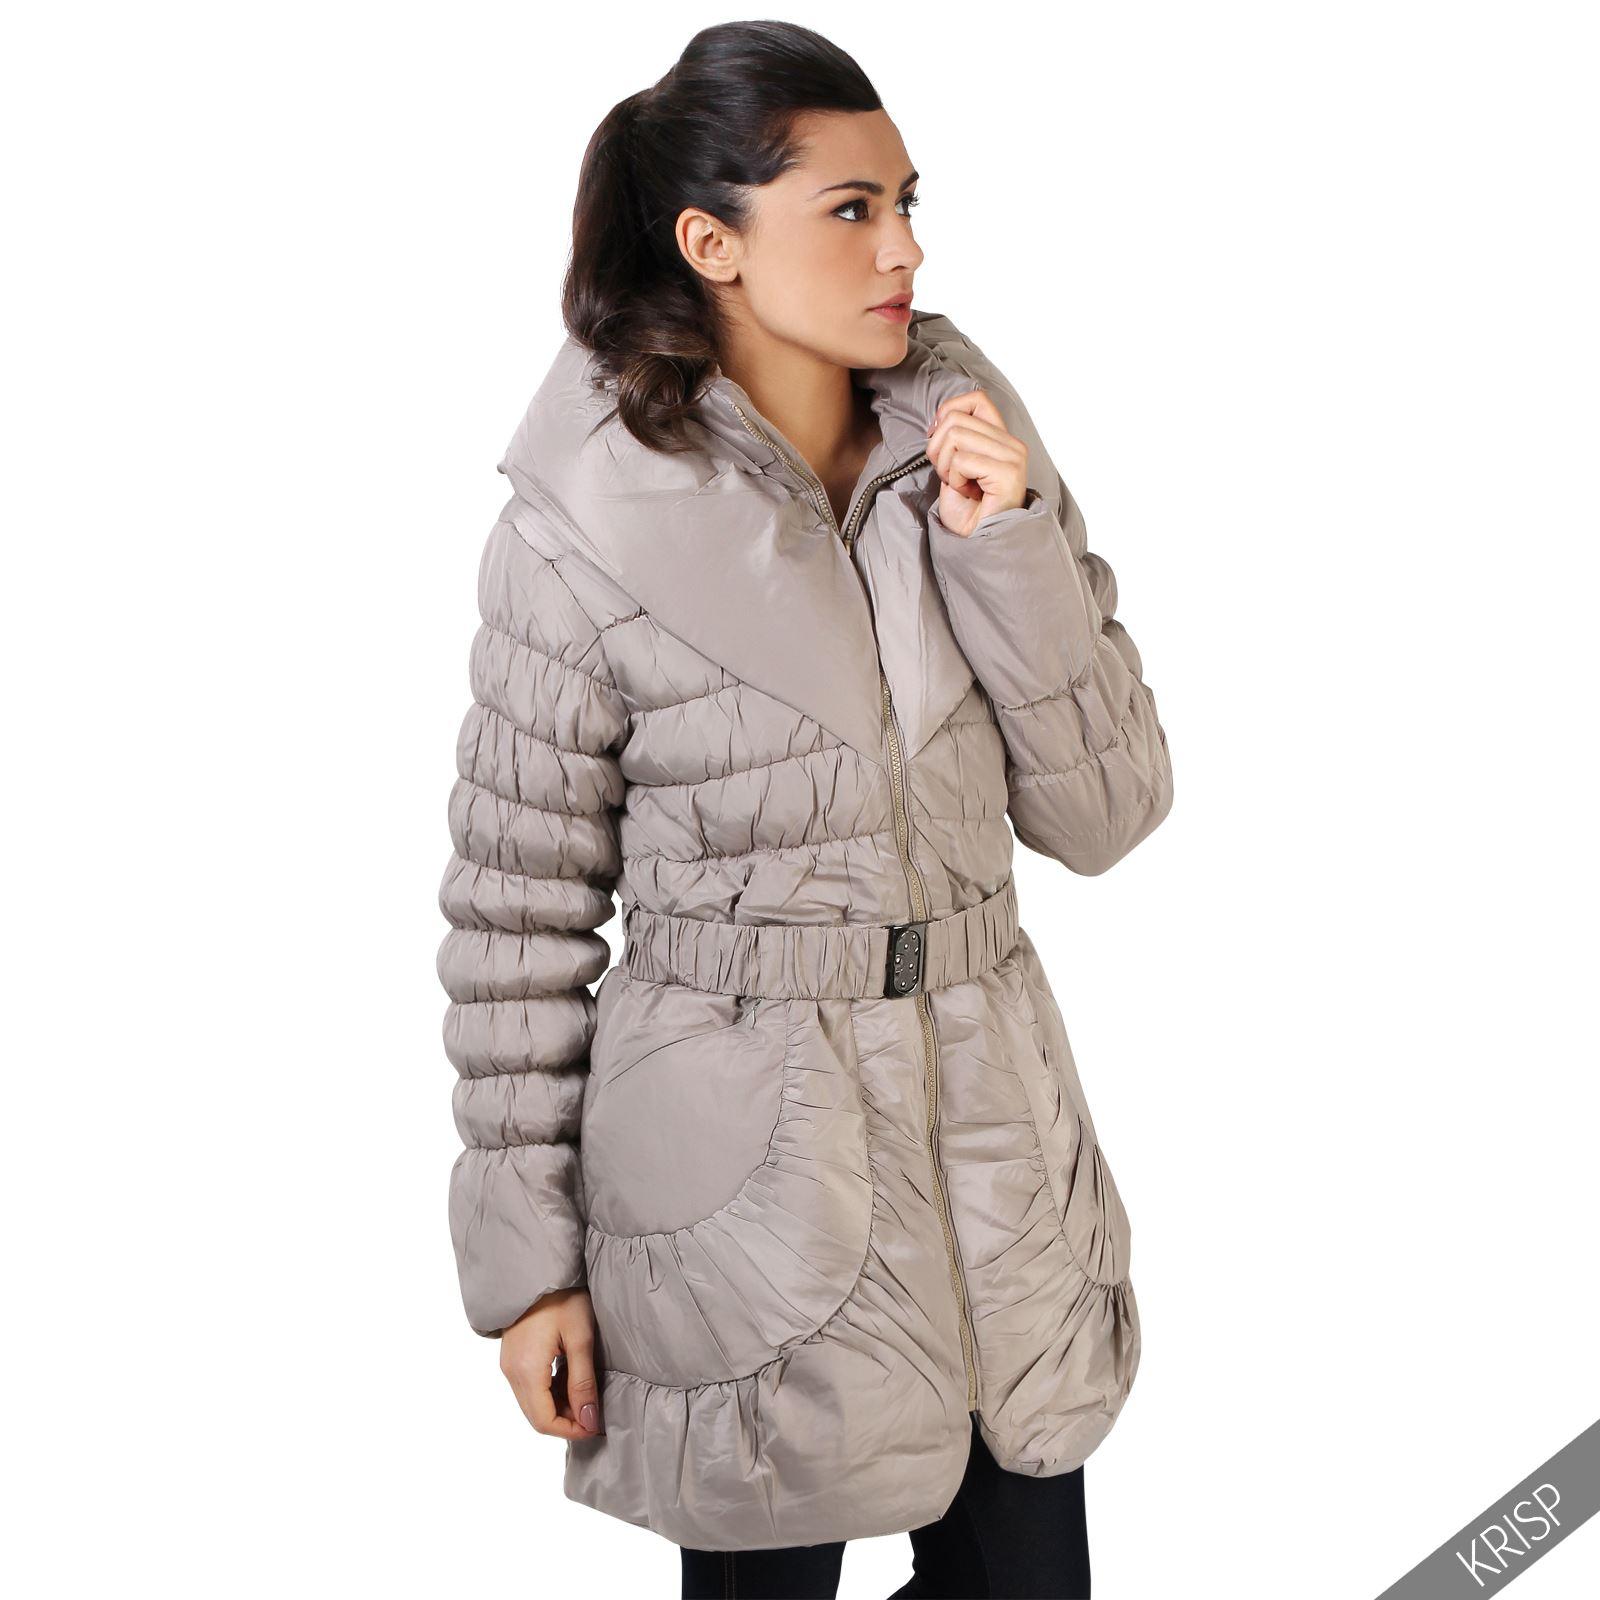 Womens puffer coats on sale